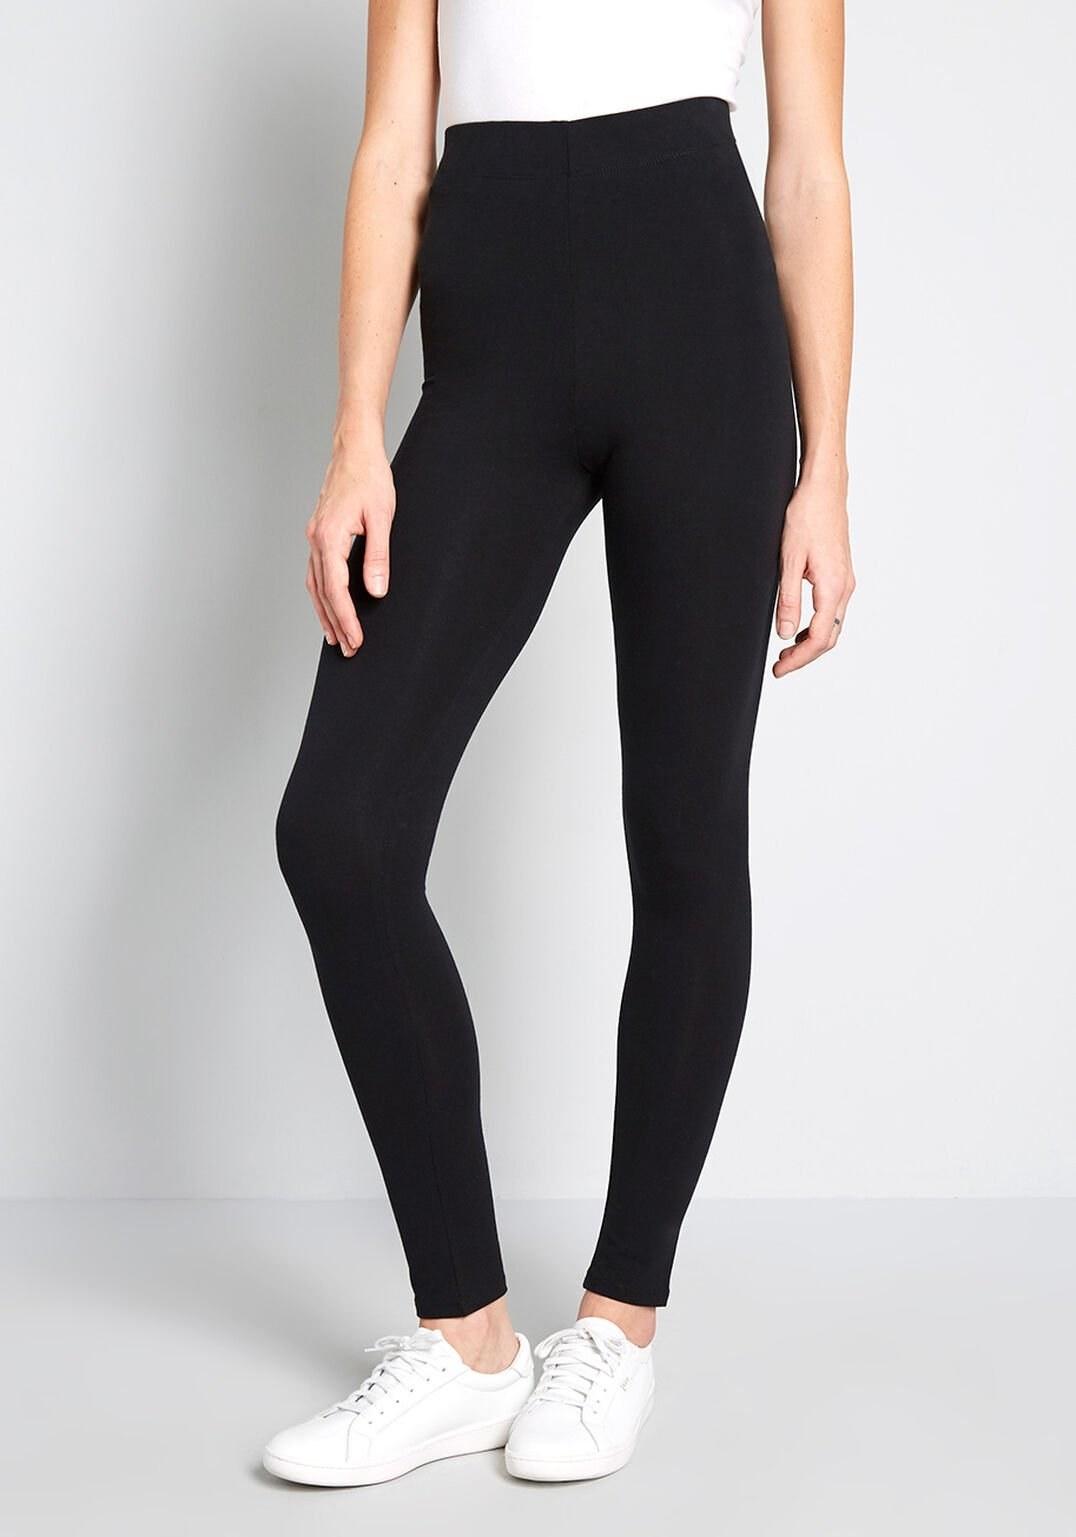 a model wearing the black high-waisted leggings